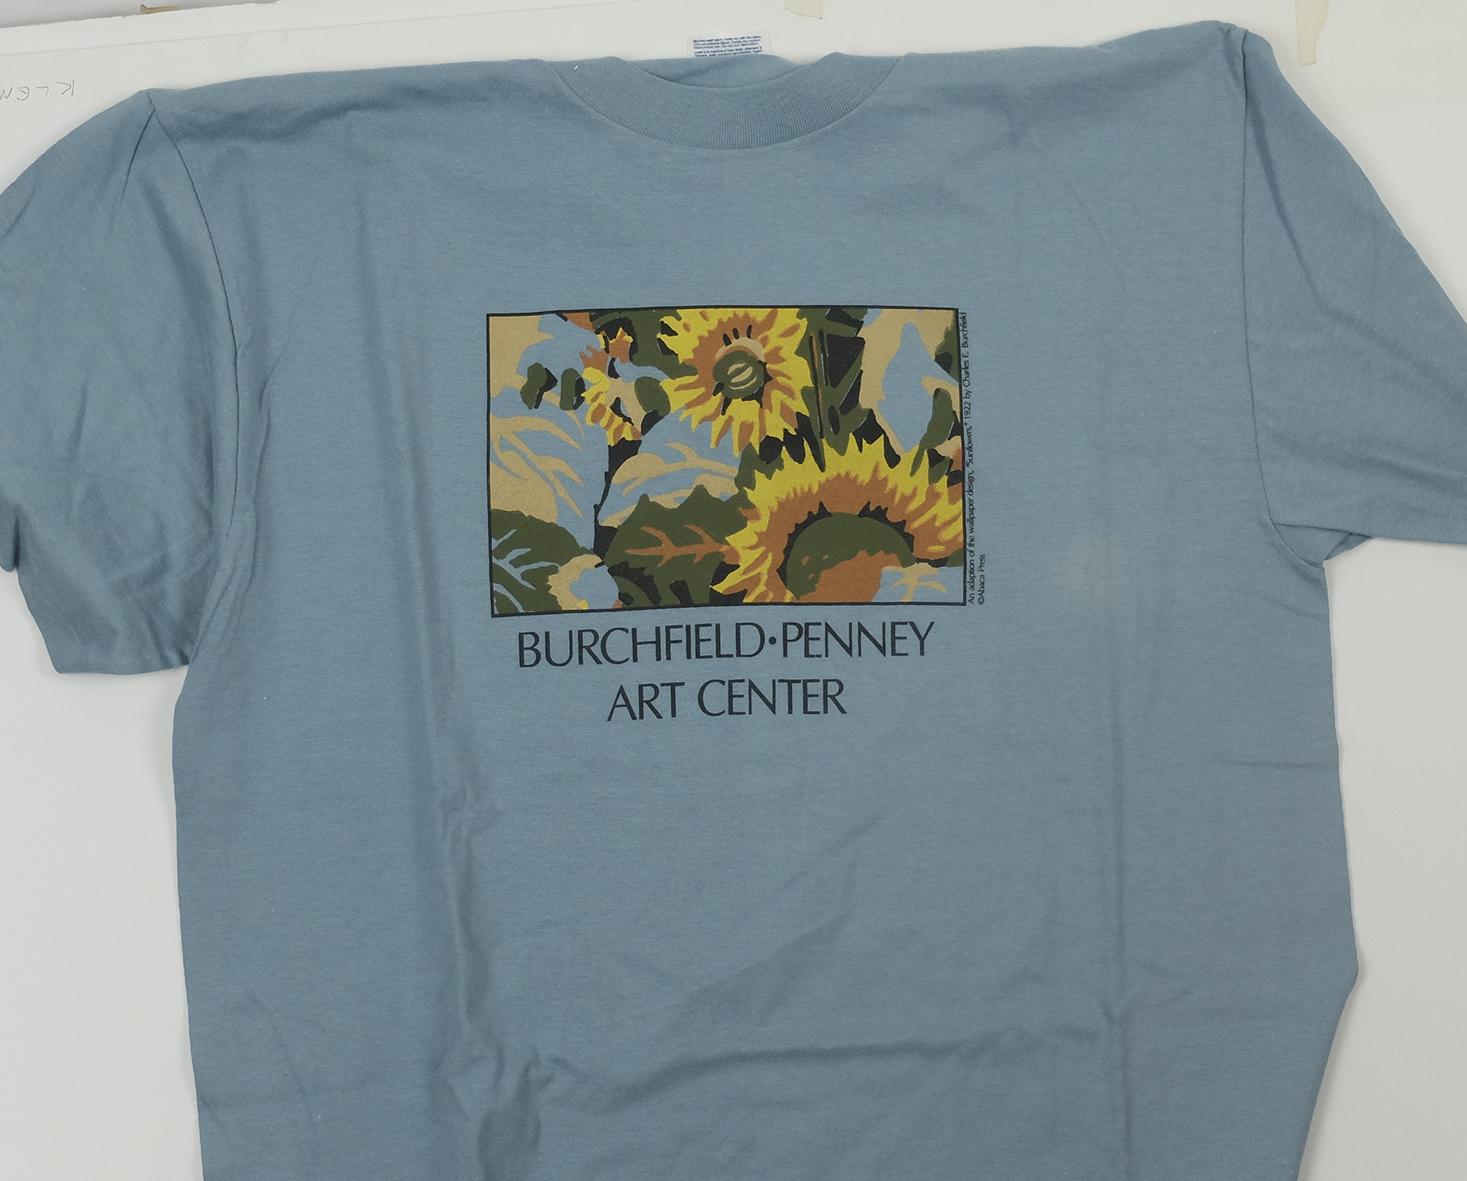 We adapted a  Charles Burchfield  wallpaper design for the Burchfield-Penney Art  Center's  shop.